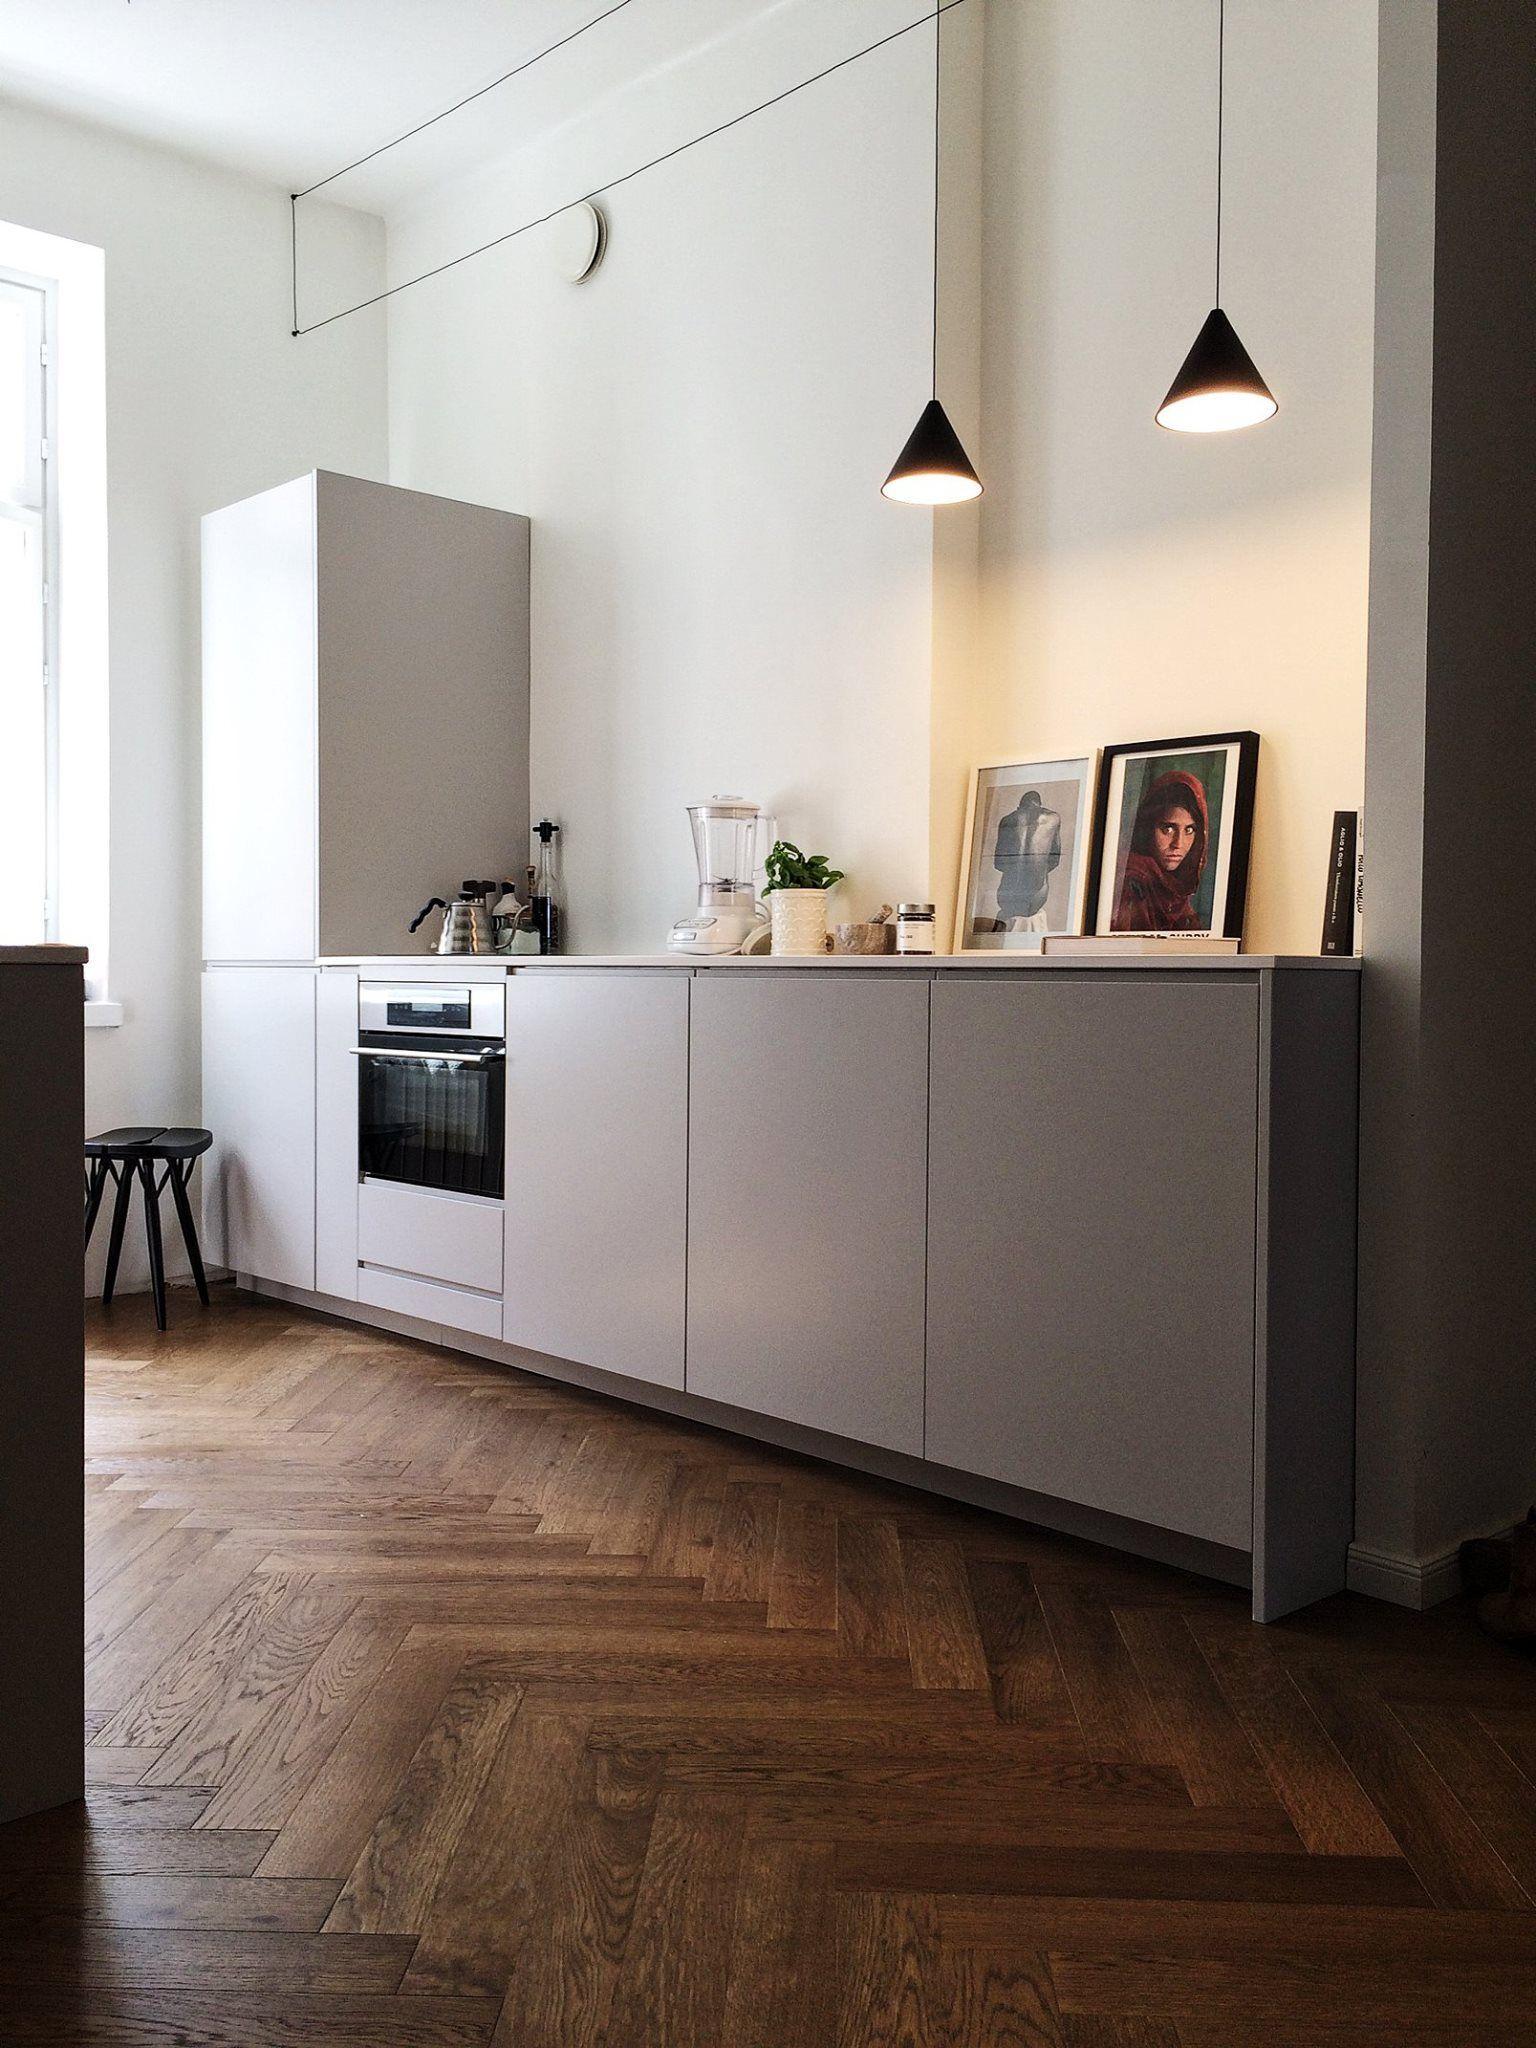 A S Helsingö High Quality Doors For Ikea Cabinet Frames Inattendu